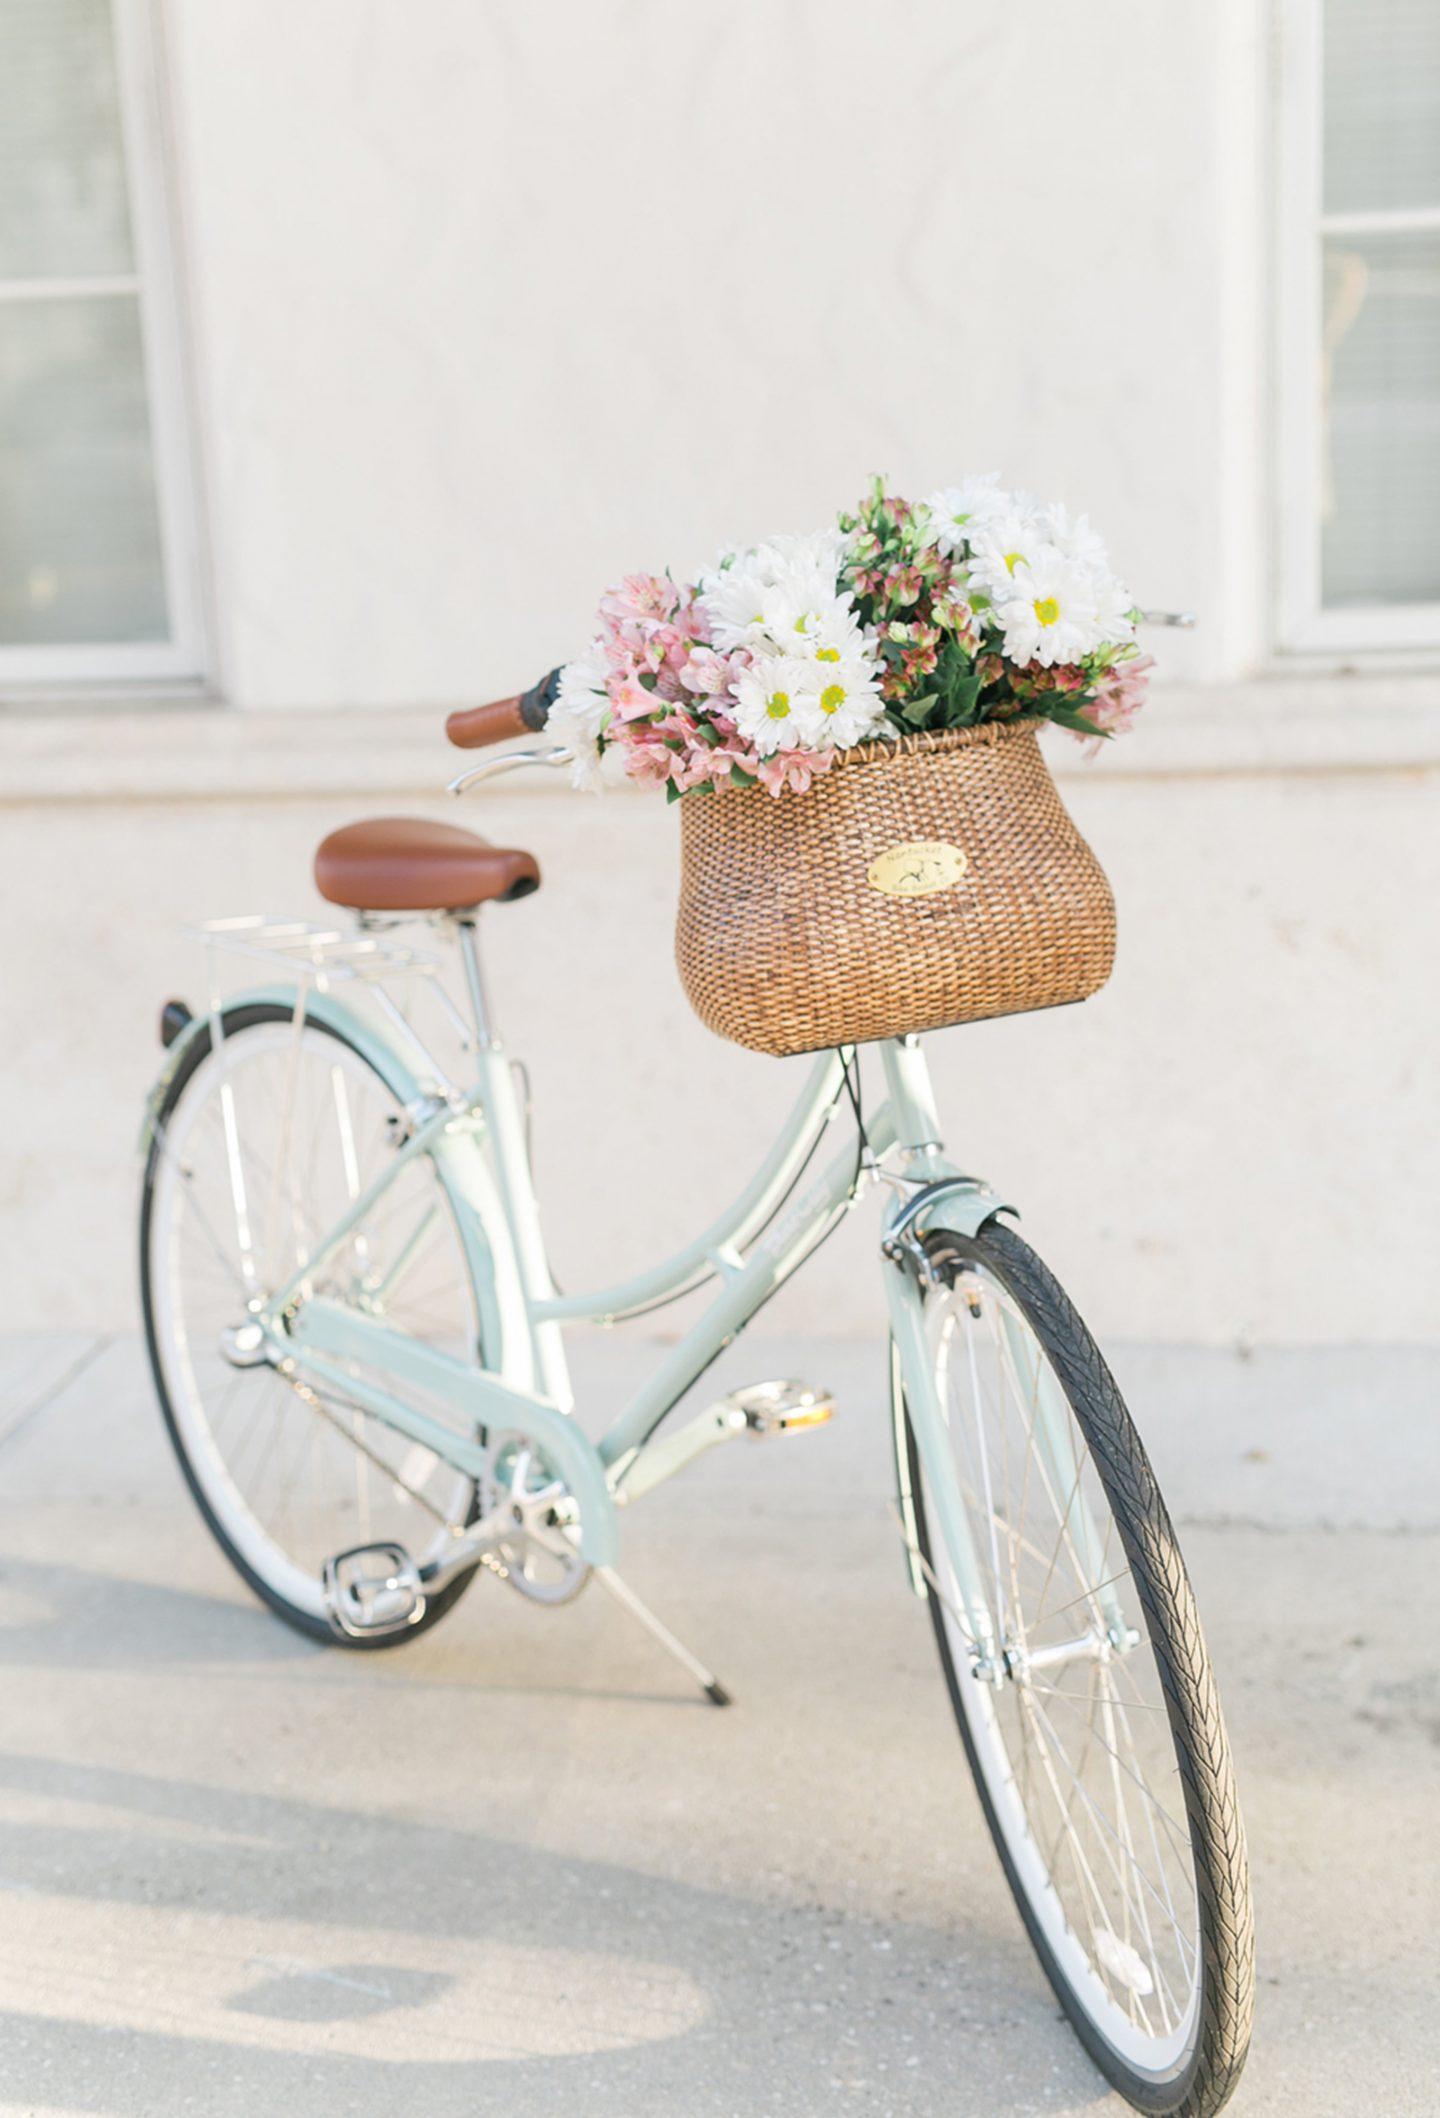 Ashley Brooke's Bike and Bike Basket with Flowers